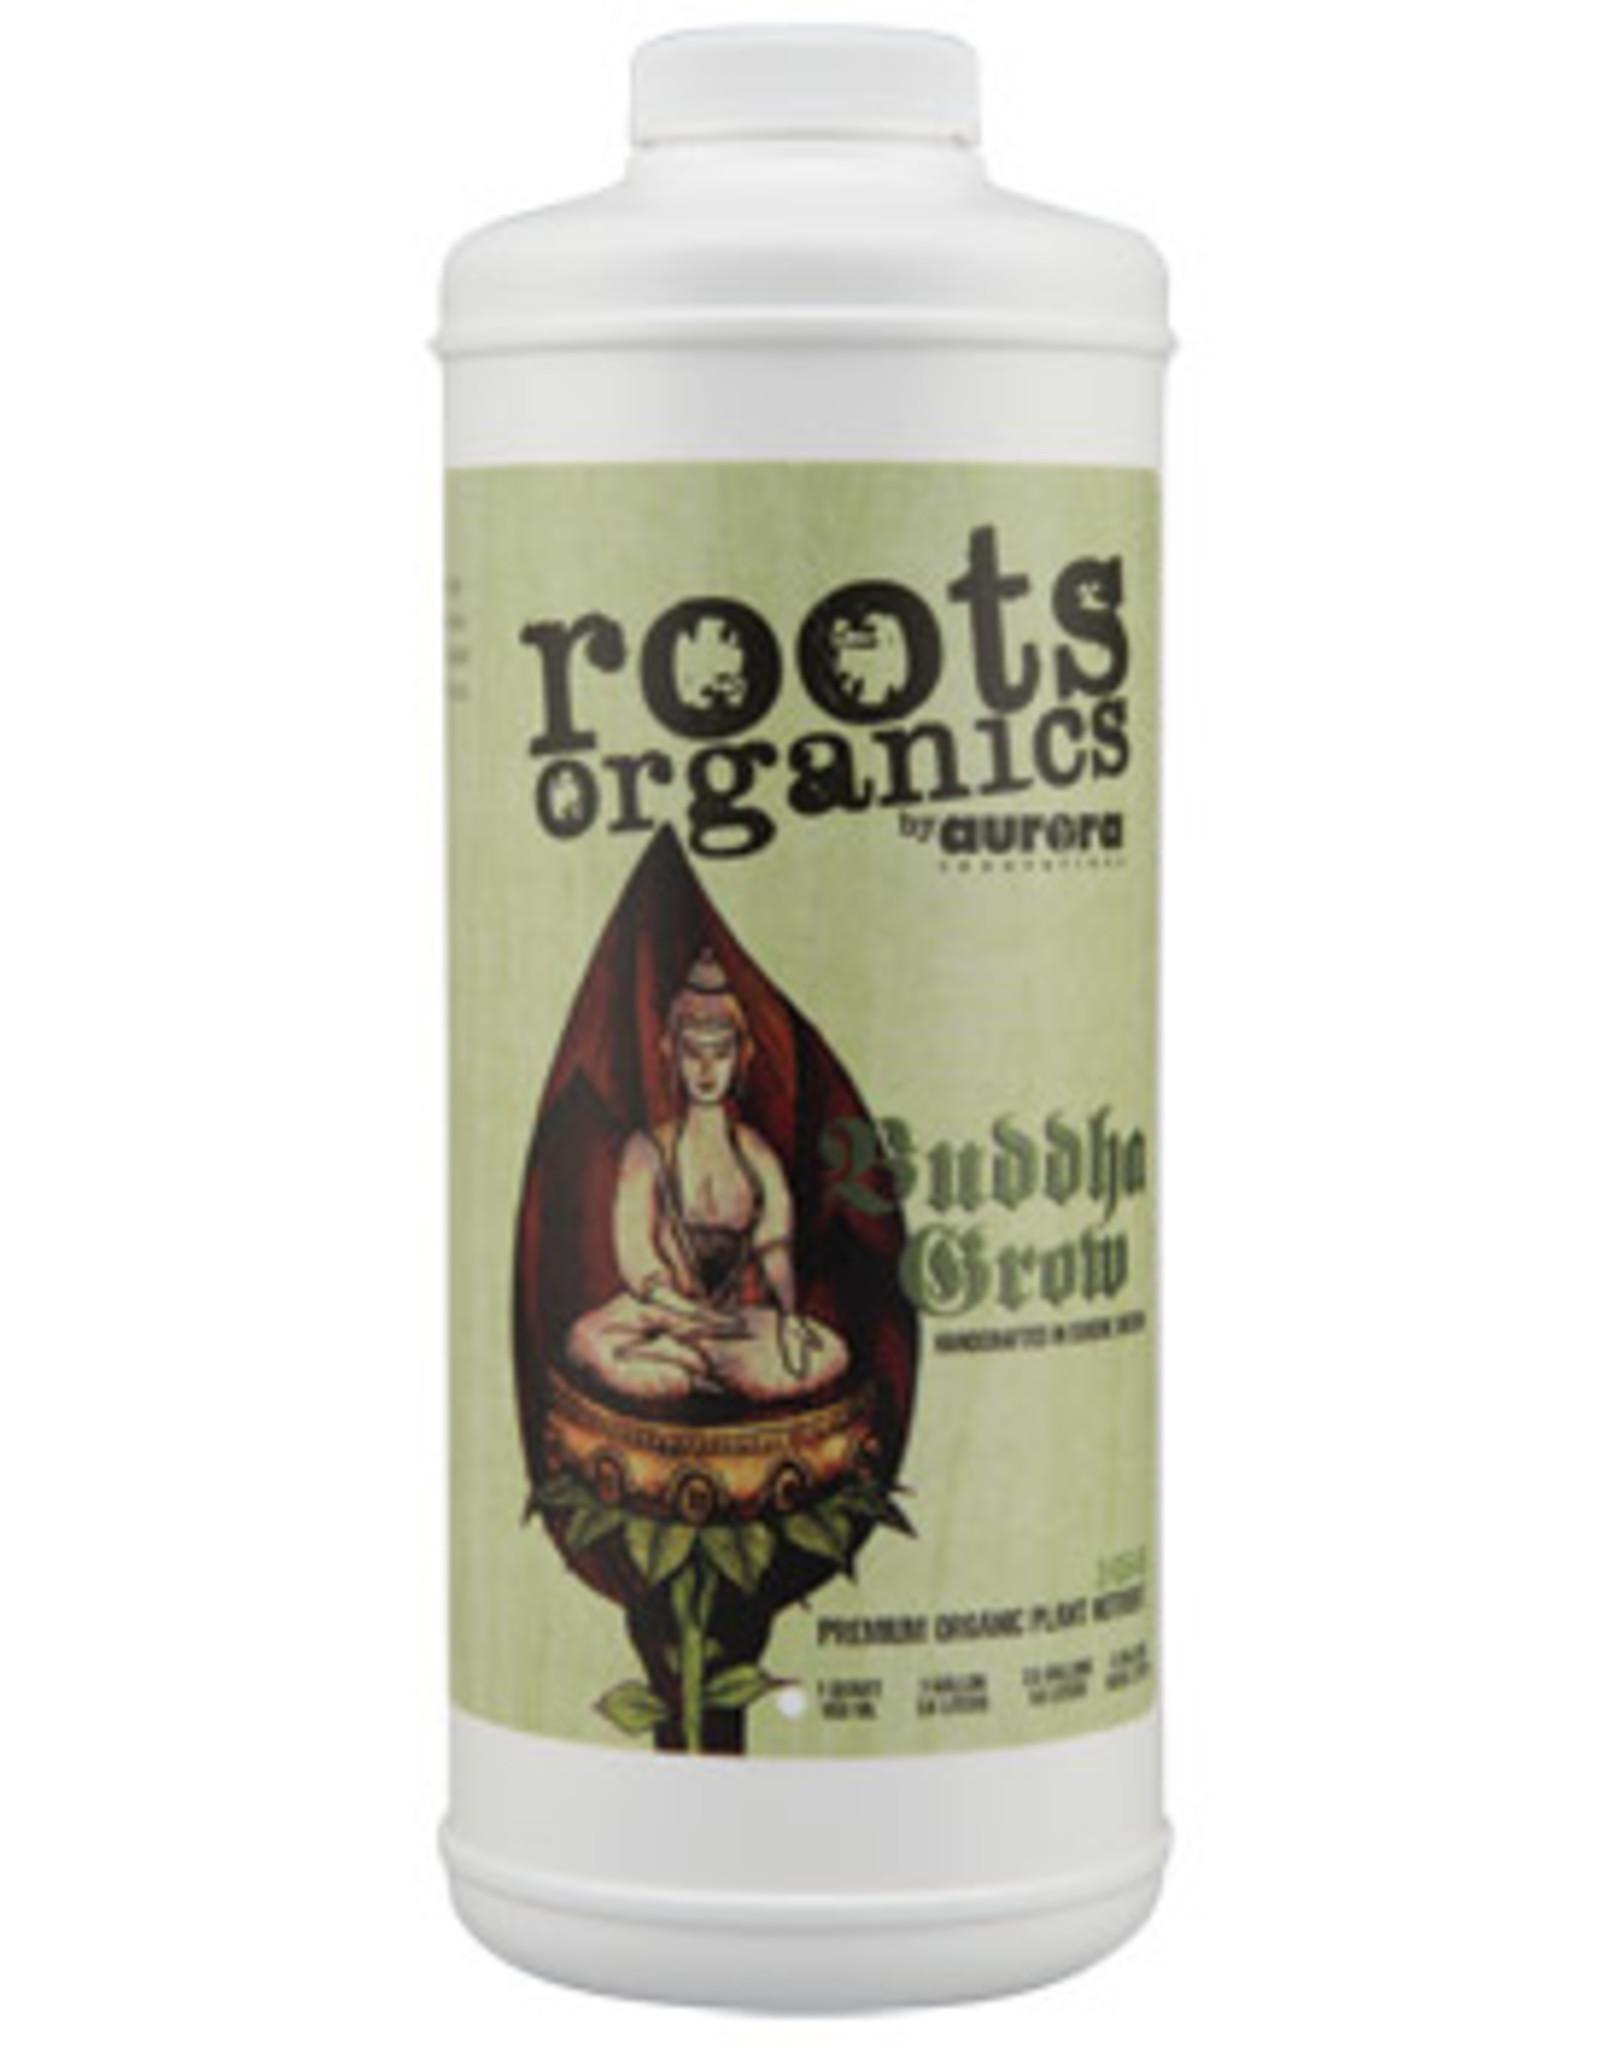 Aurora Innovations Roots Buddha Grow qt